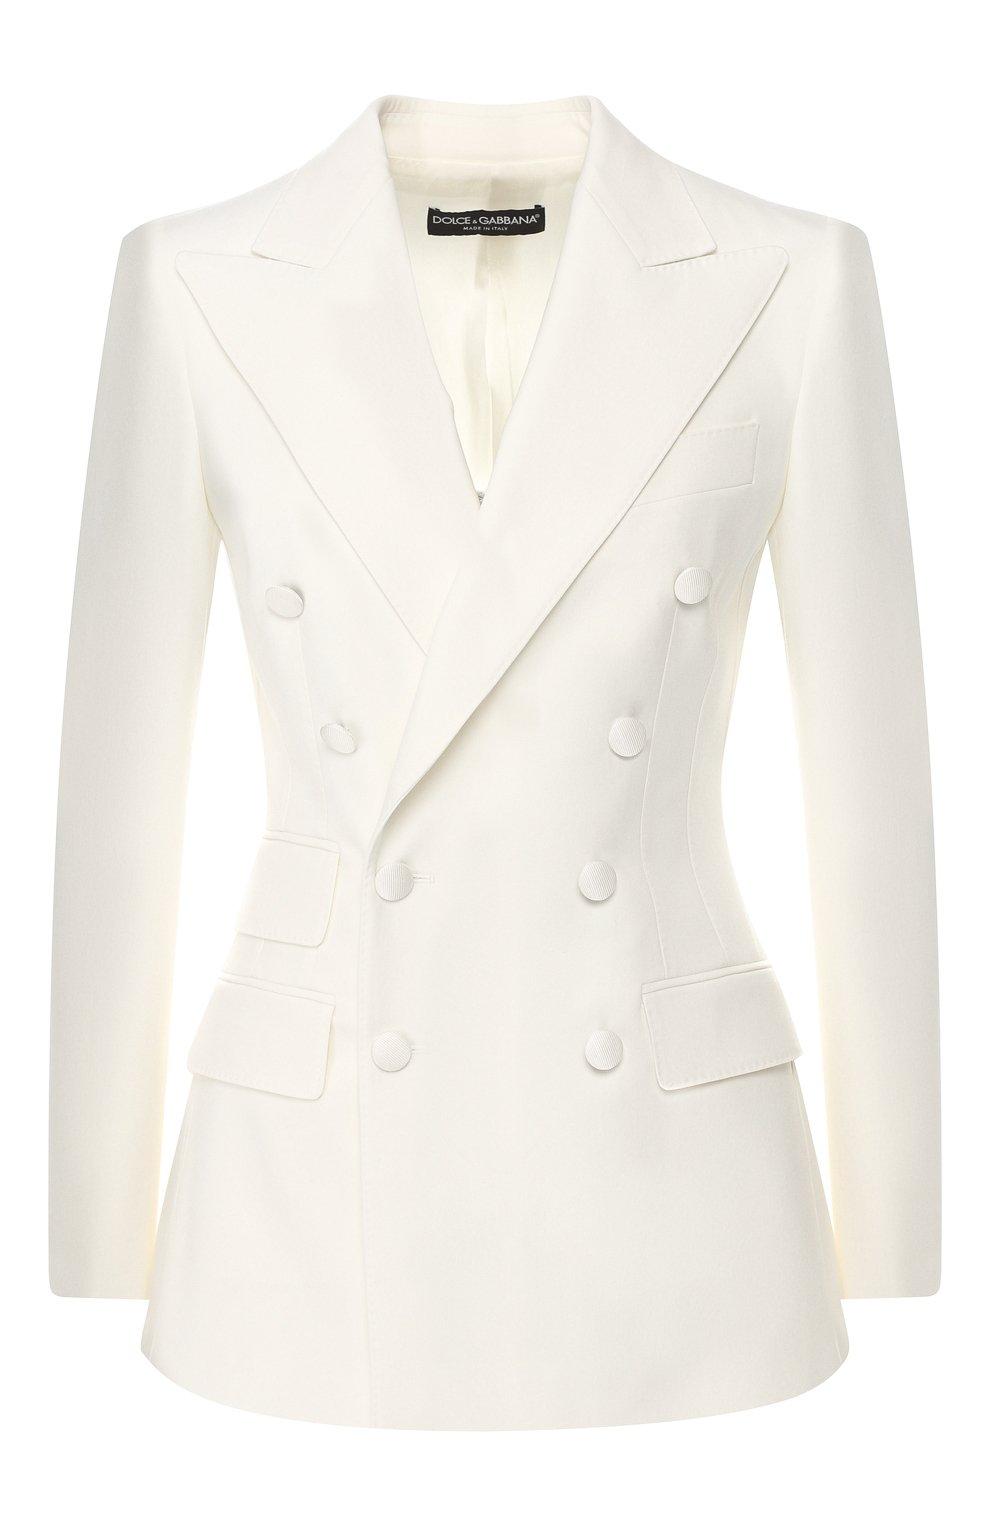 Шерстяной жакет Dolce & Gabbana белый | Фото №1